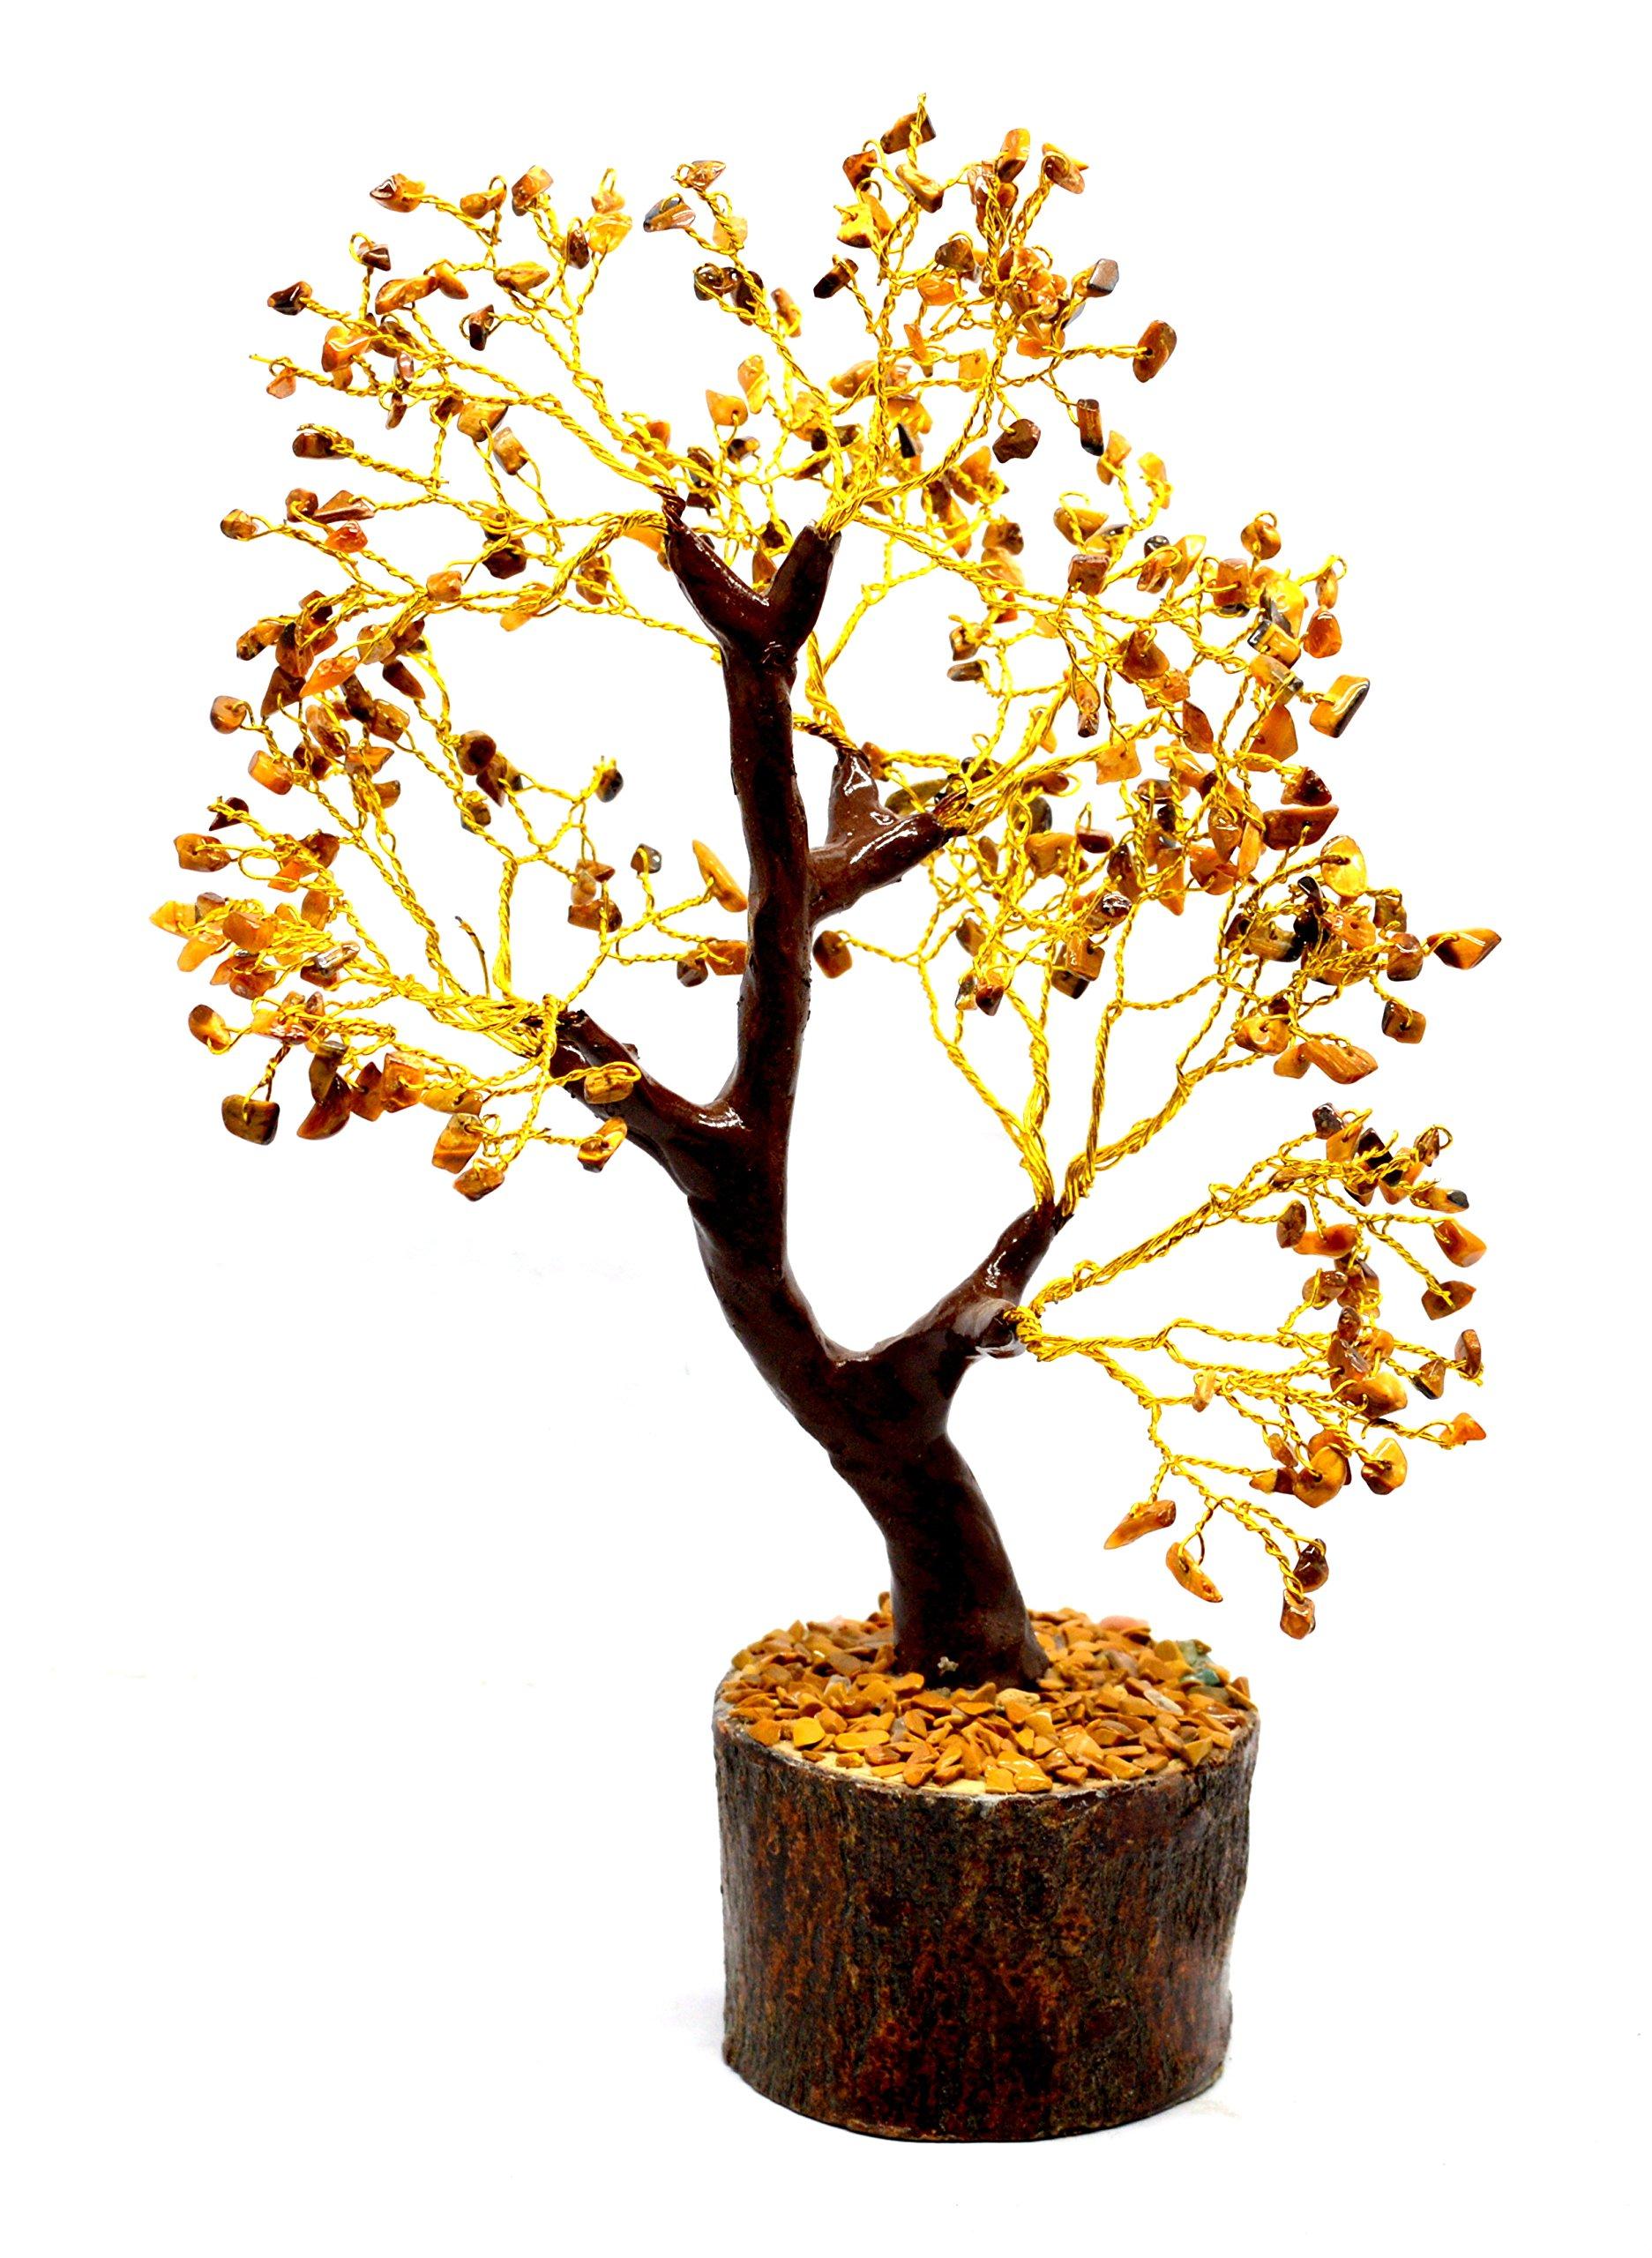 Natural Gemstone Reiki Healing Feng Shui Gem Tree Home Vastu Table Decor Rough Stone Raw Beads Wellness Happiness Gift (Tiger Eye - Wood)